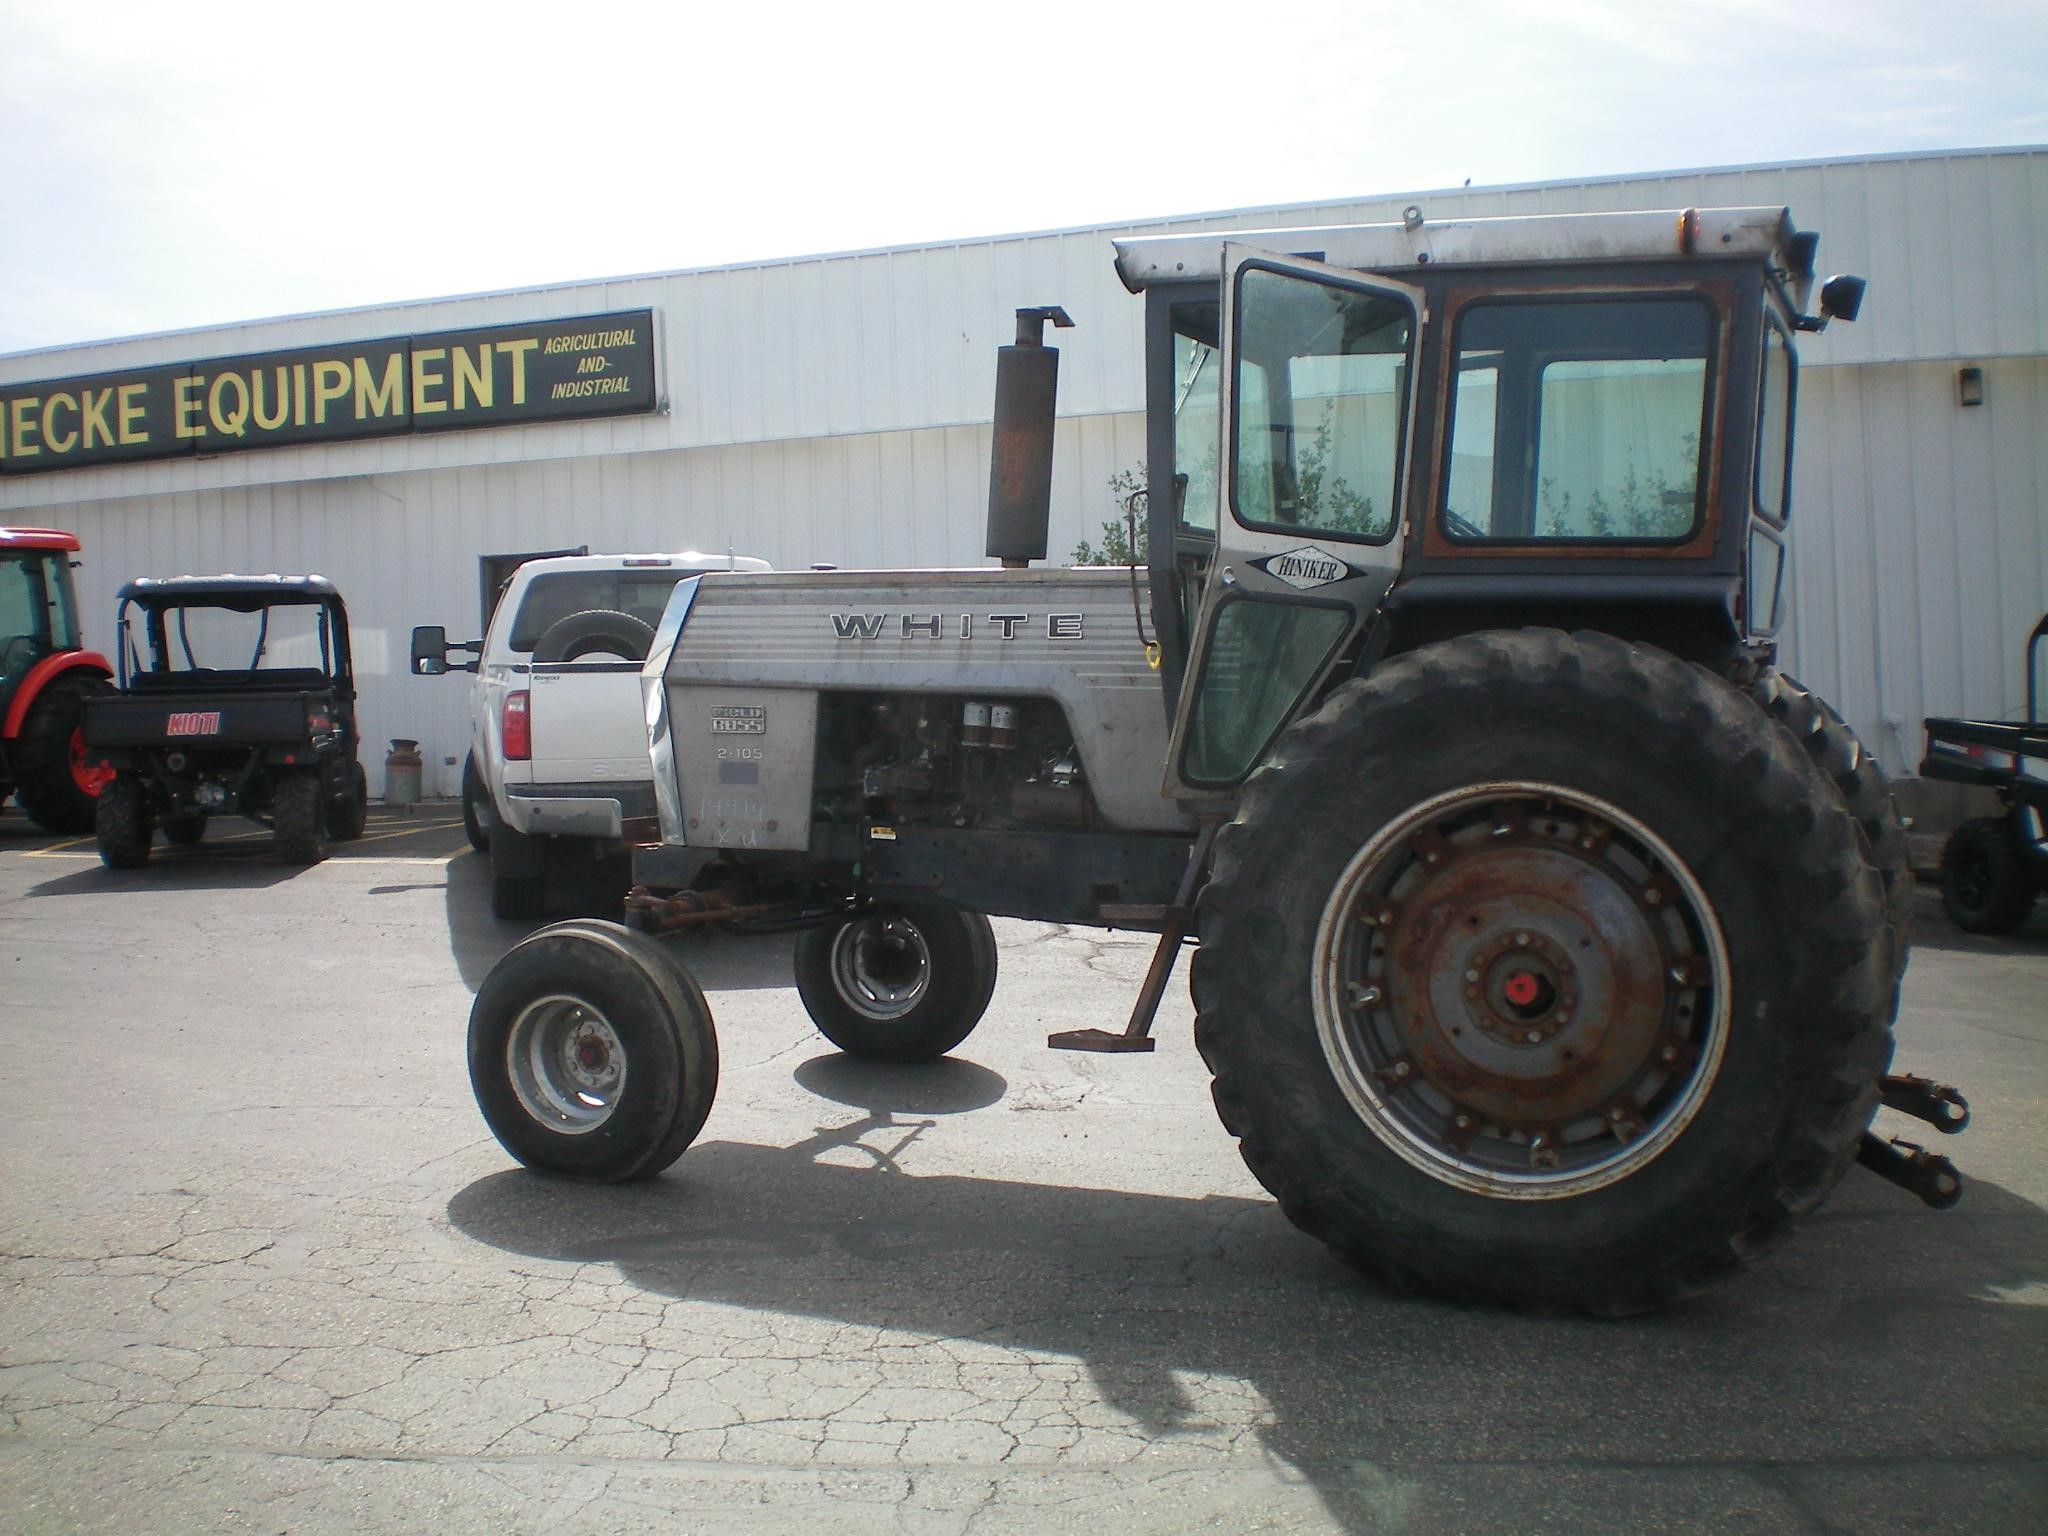 1976 White 2-105 Tractor